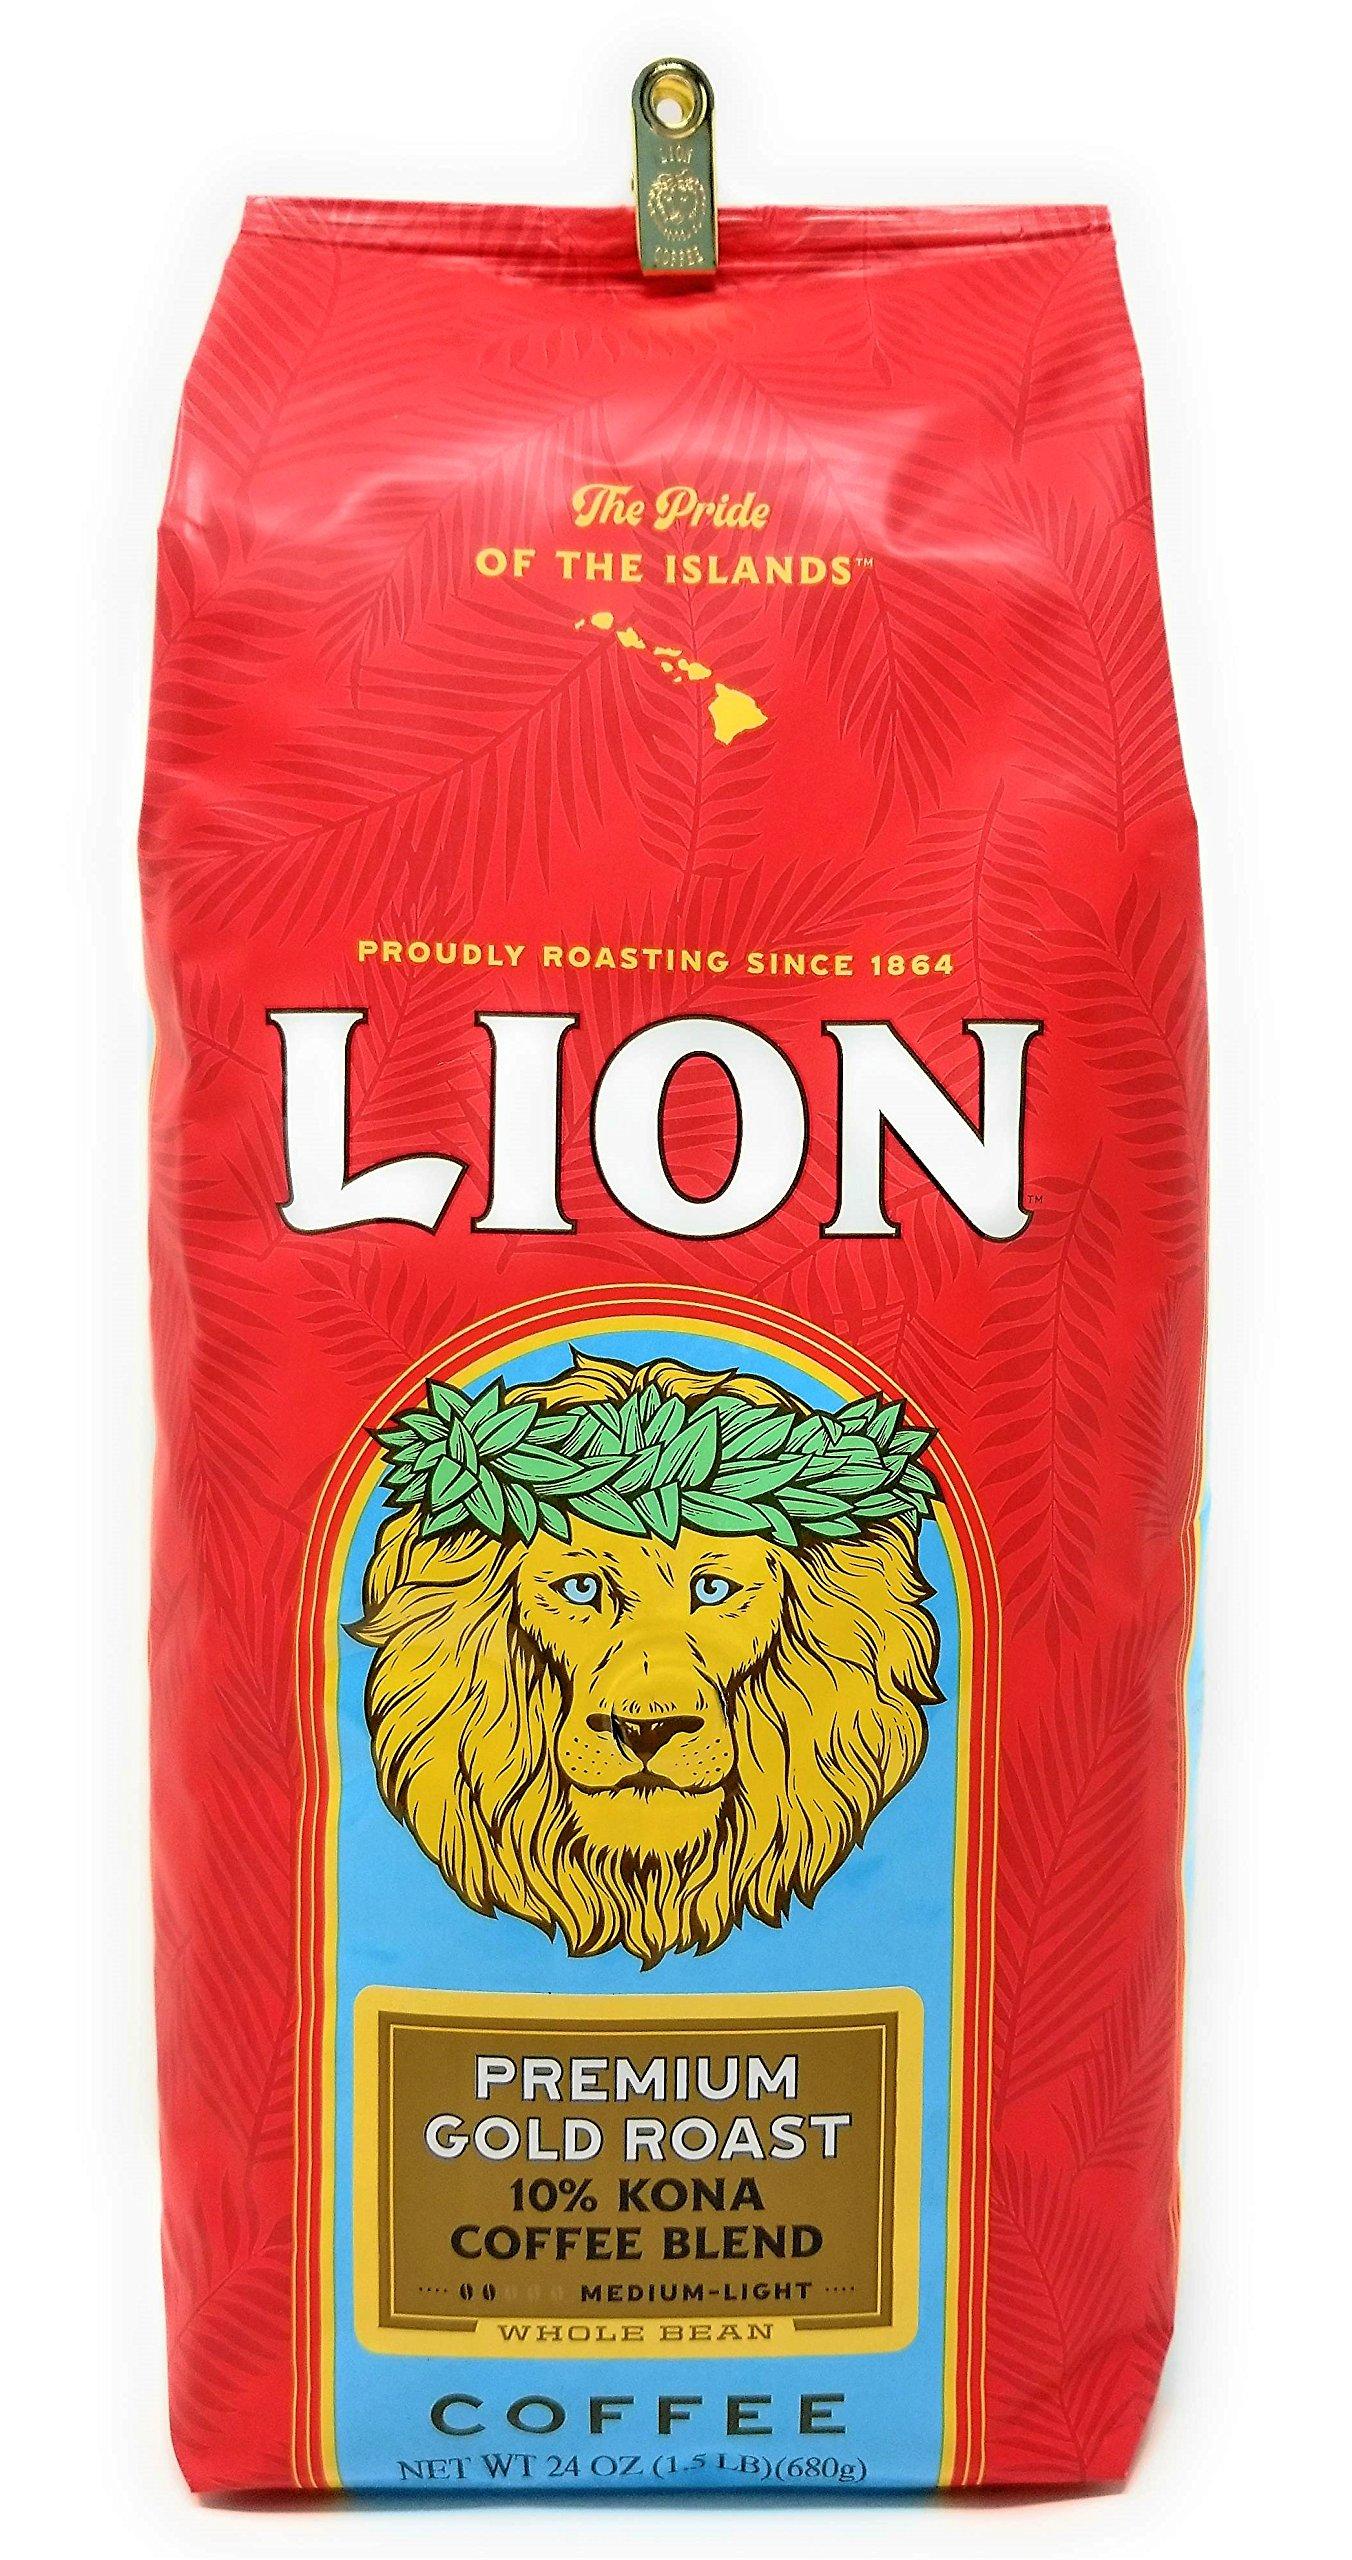 9b1de2218448eb Lion Coffee PREMIUM GOLD ROAST, 10% Kona Coffee Blend, MEDIUM-LIGHT Roast